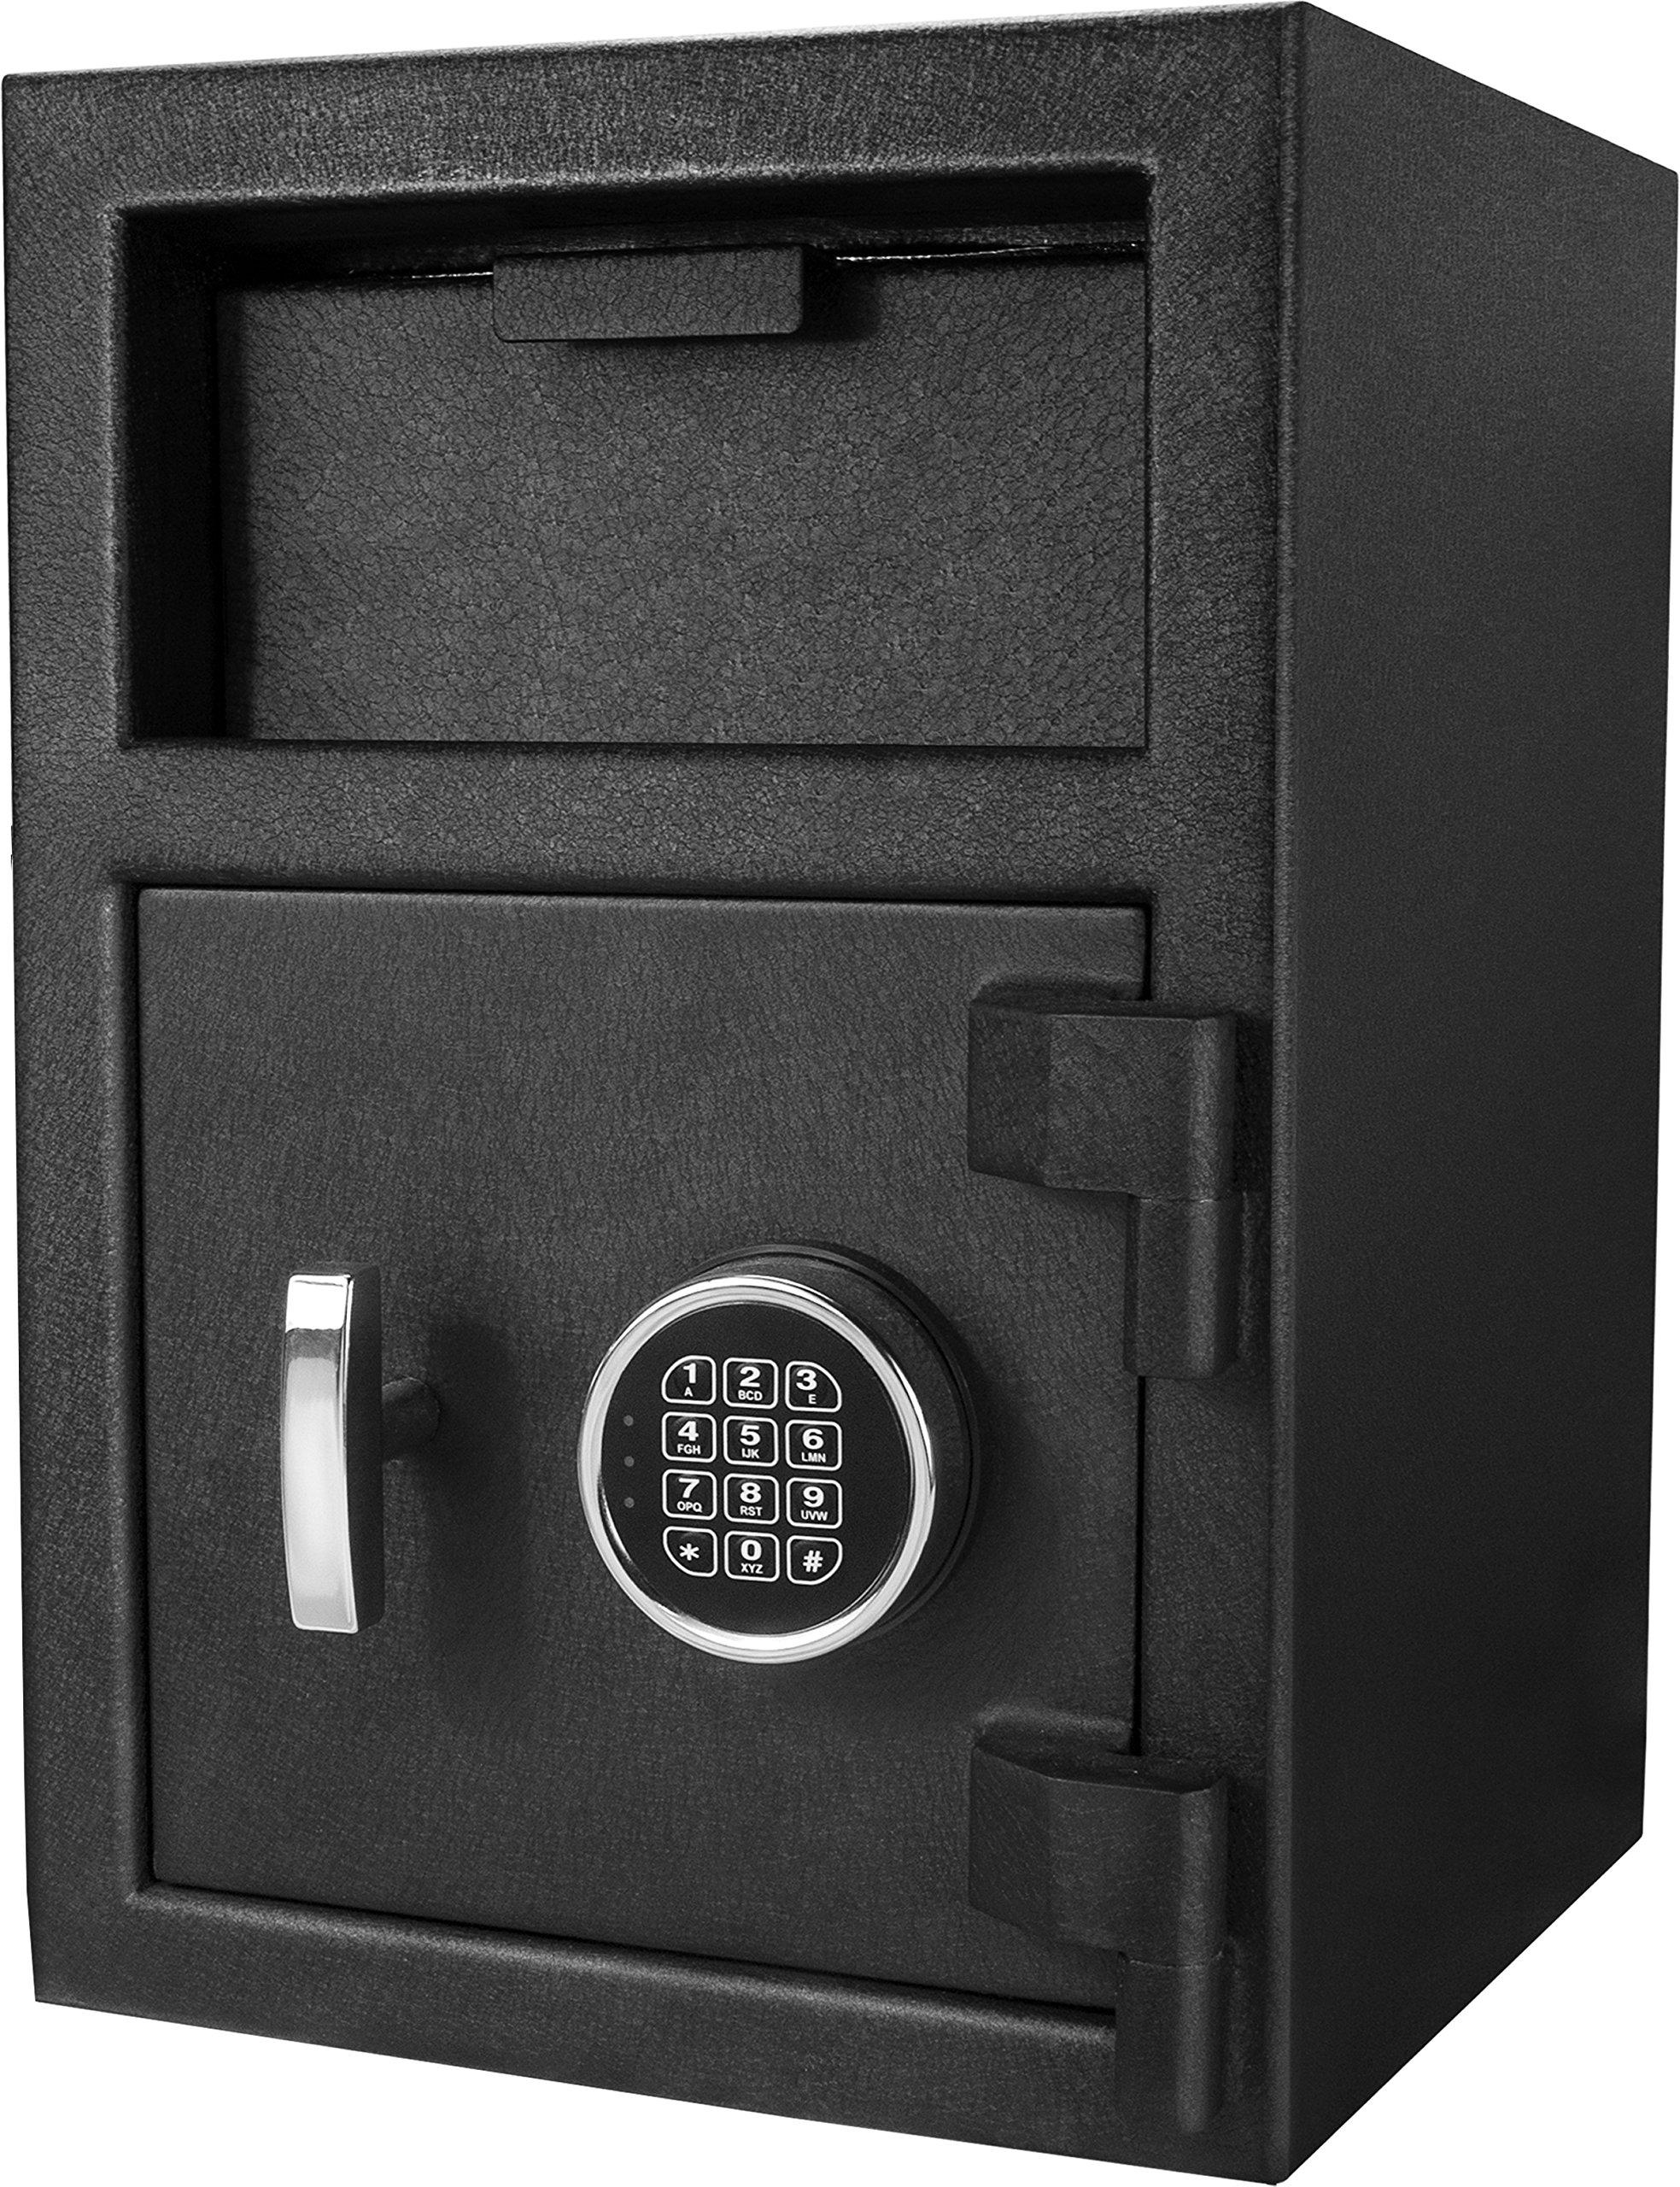 Barska AX12588 Standard Depository Keypad Safe by BARSKA